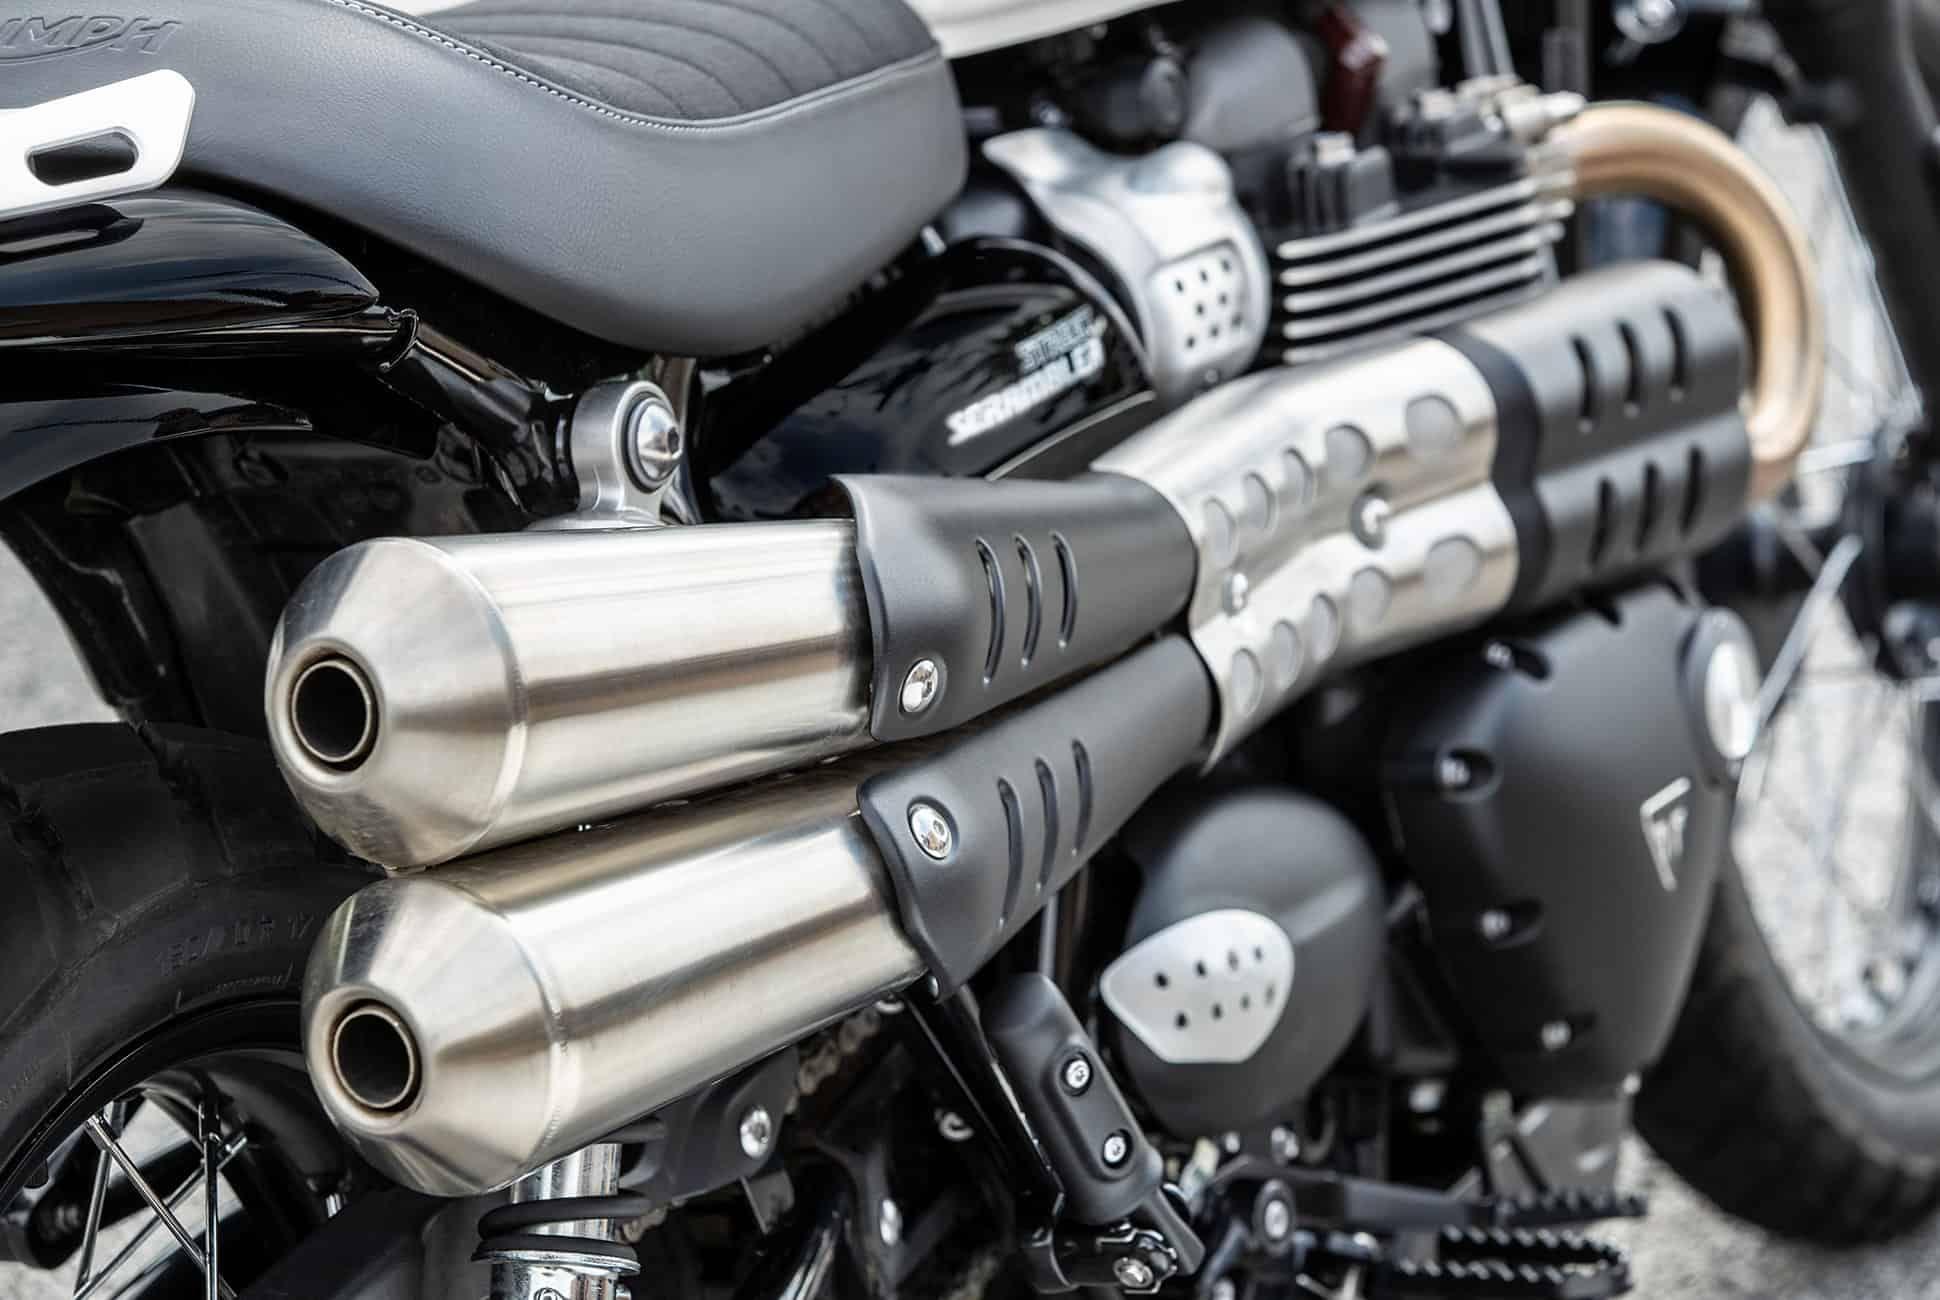 2019-Triumph-Street-Scrambler-gear-patrol-slide-11